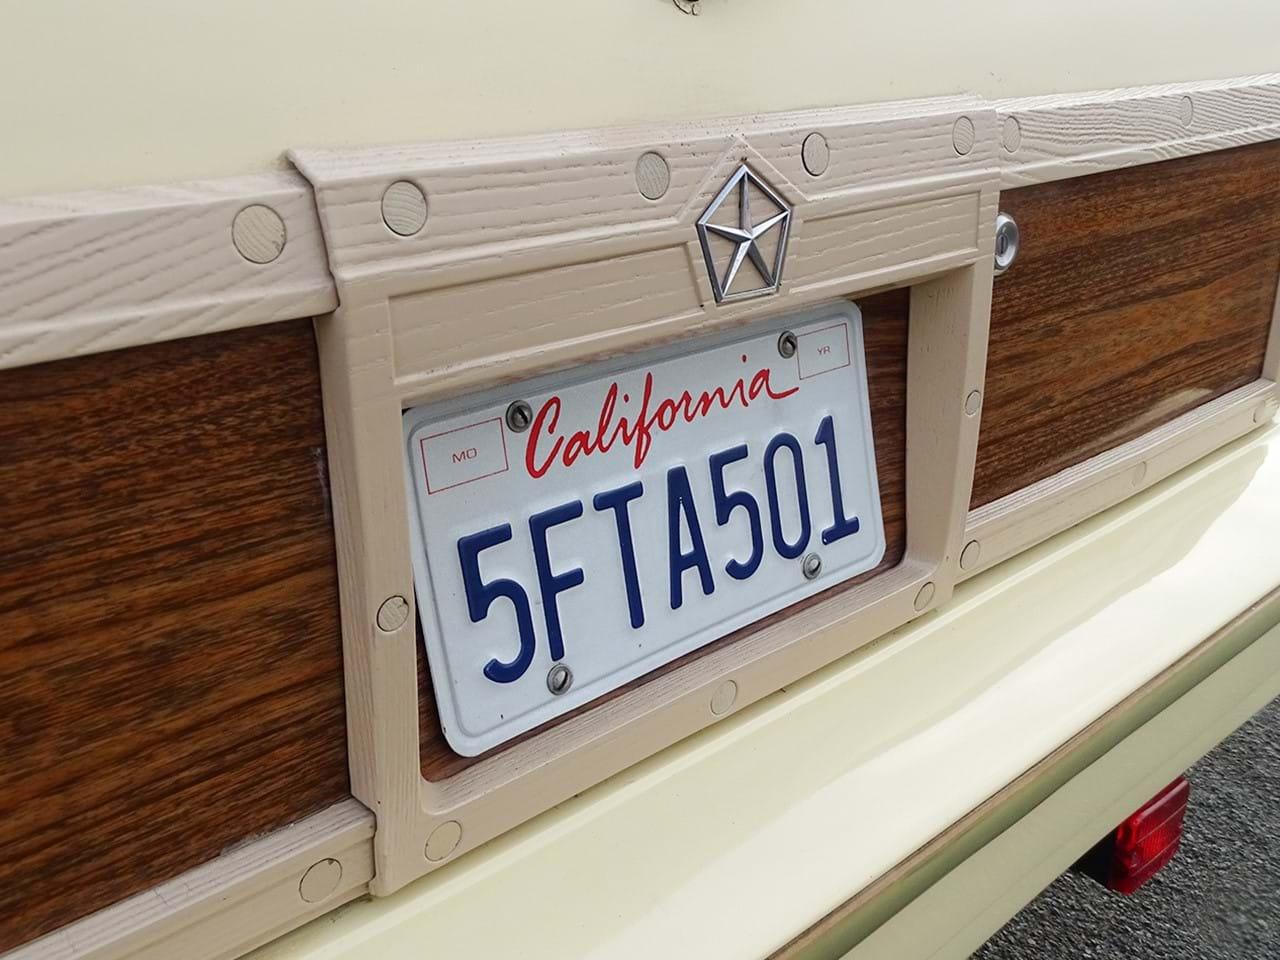 1985 Chrysler LeBaron Town and Country Wagon license plate